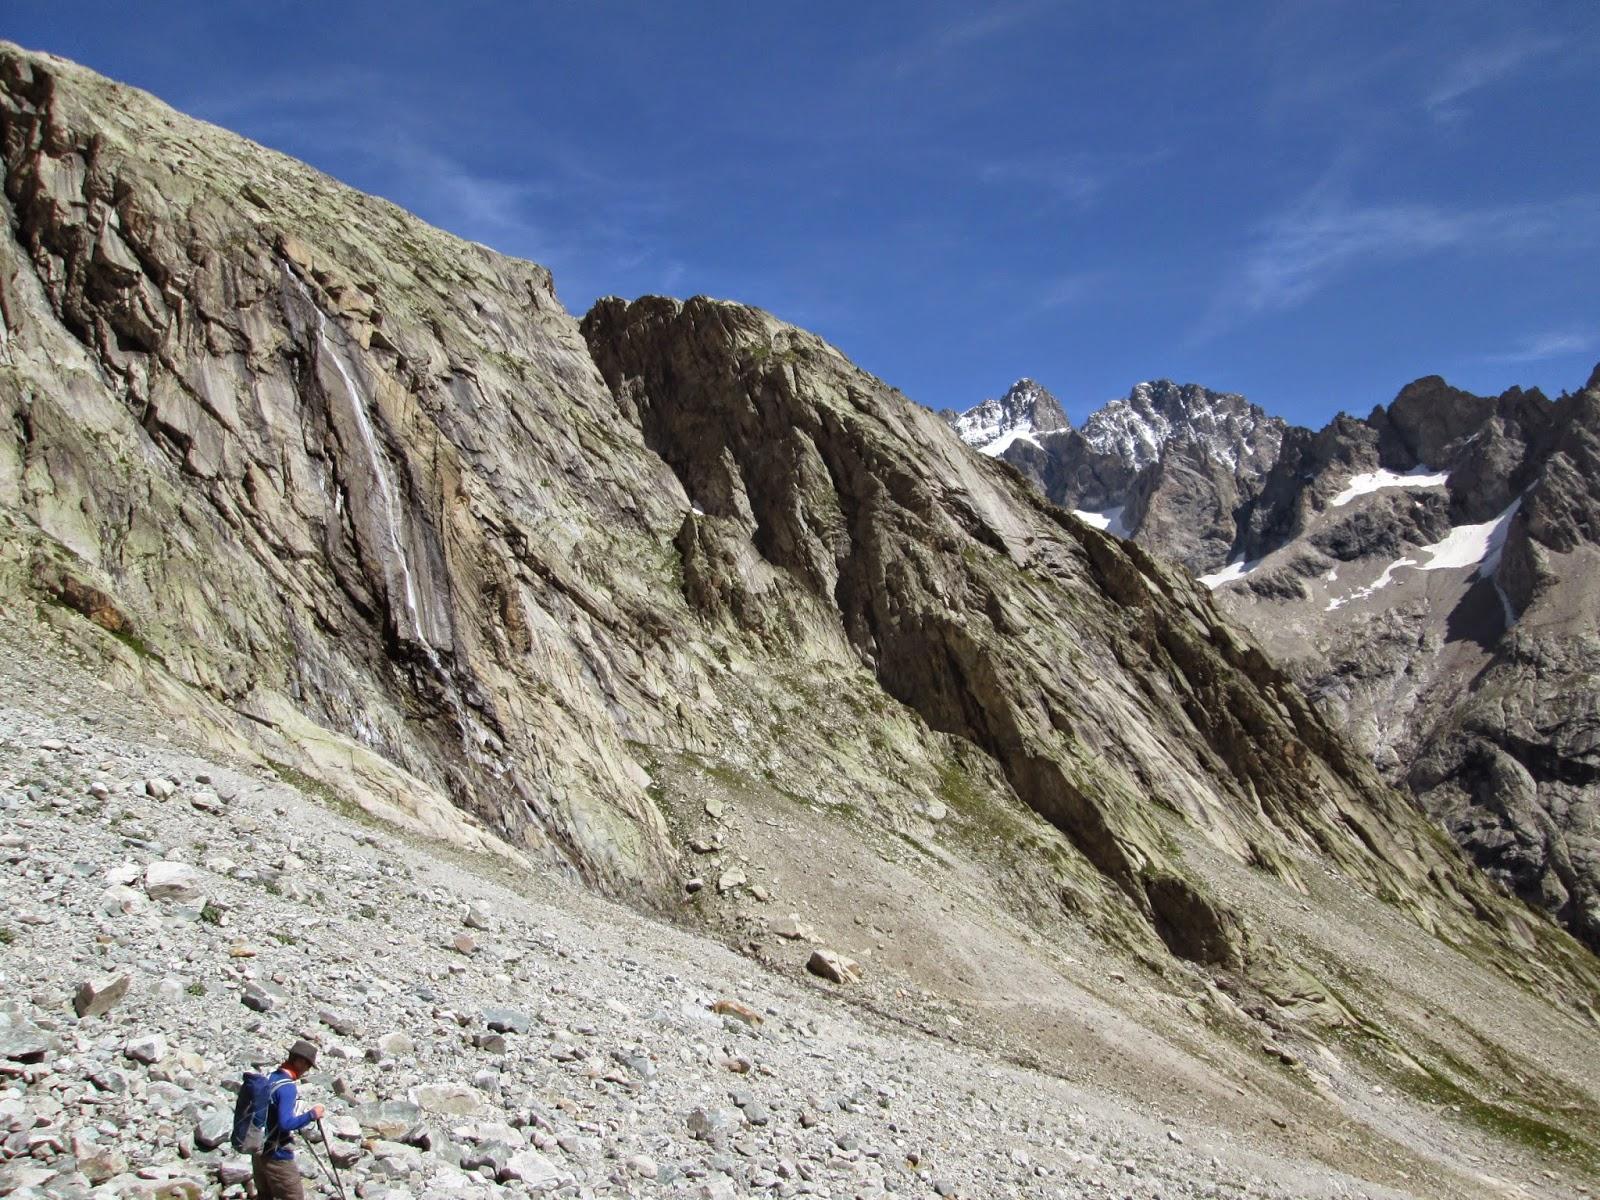 La Meije, Ecrins National Park, Alps, France